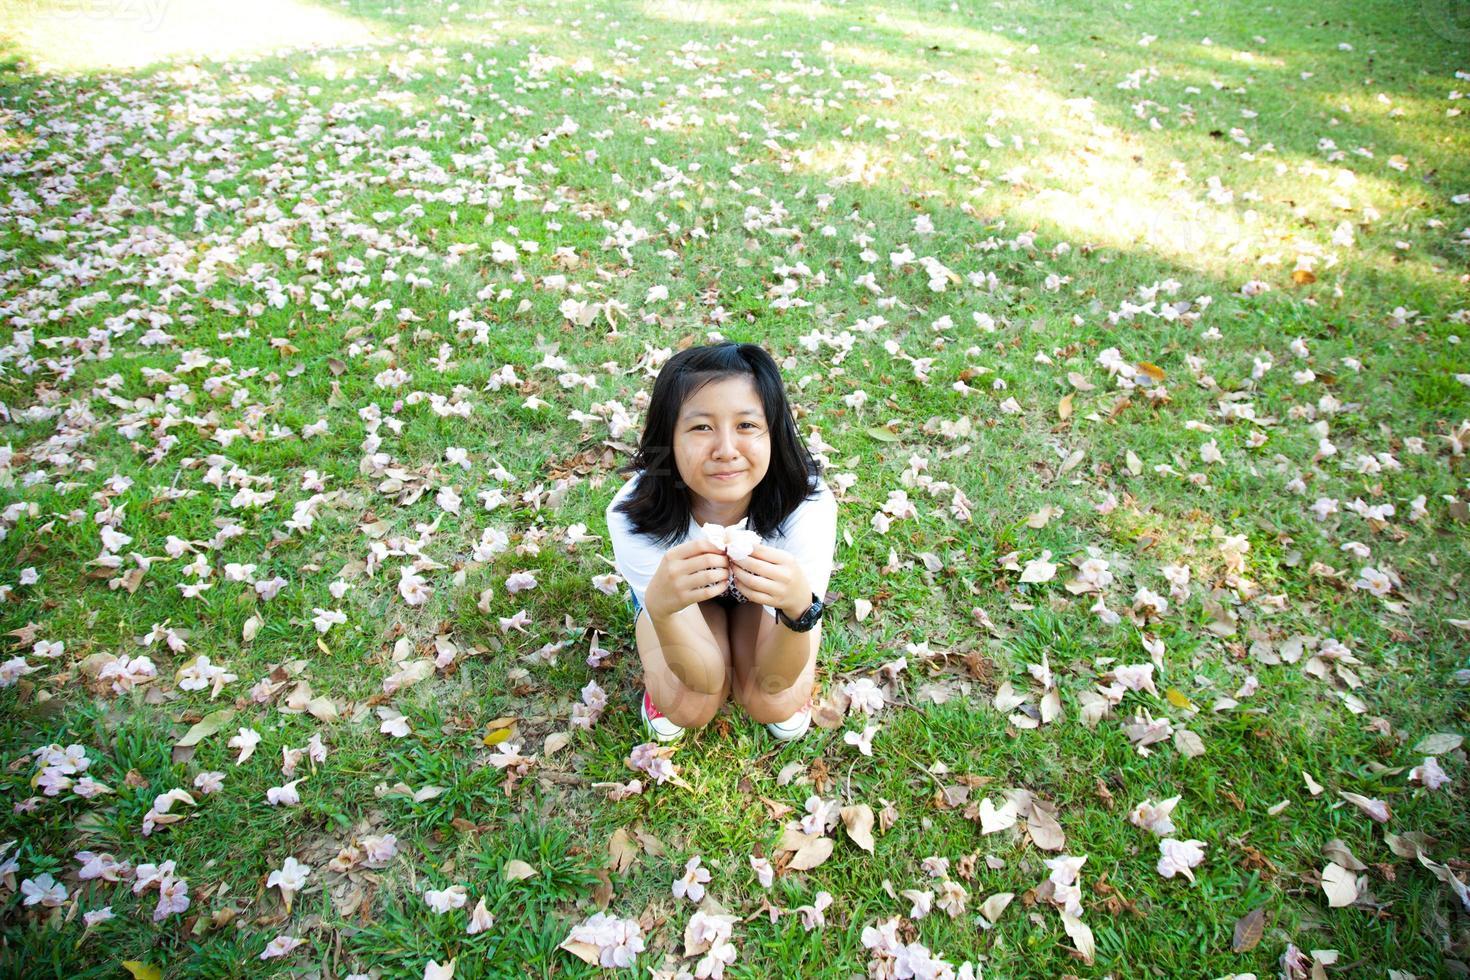 ragazza seduta sull'erba foto